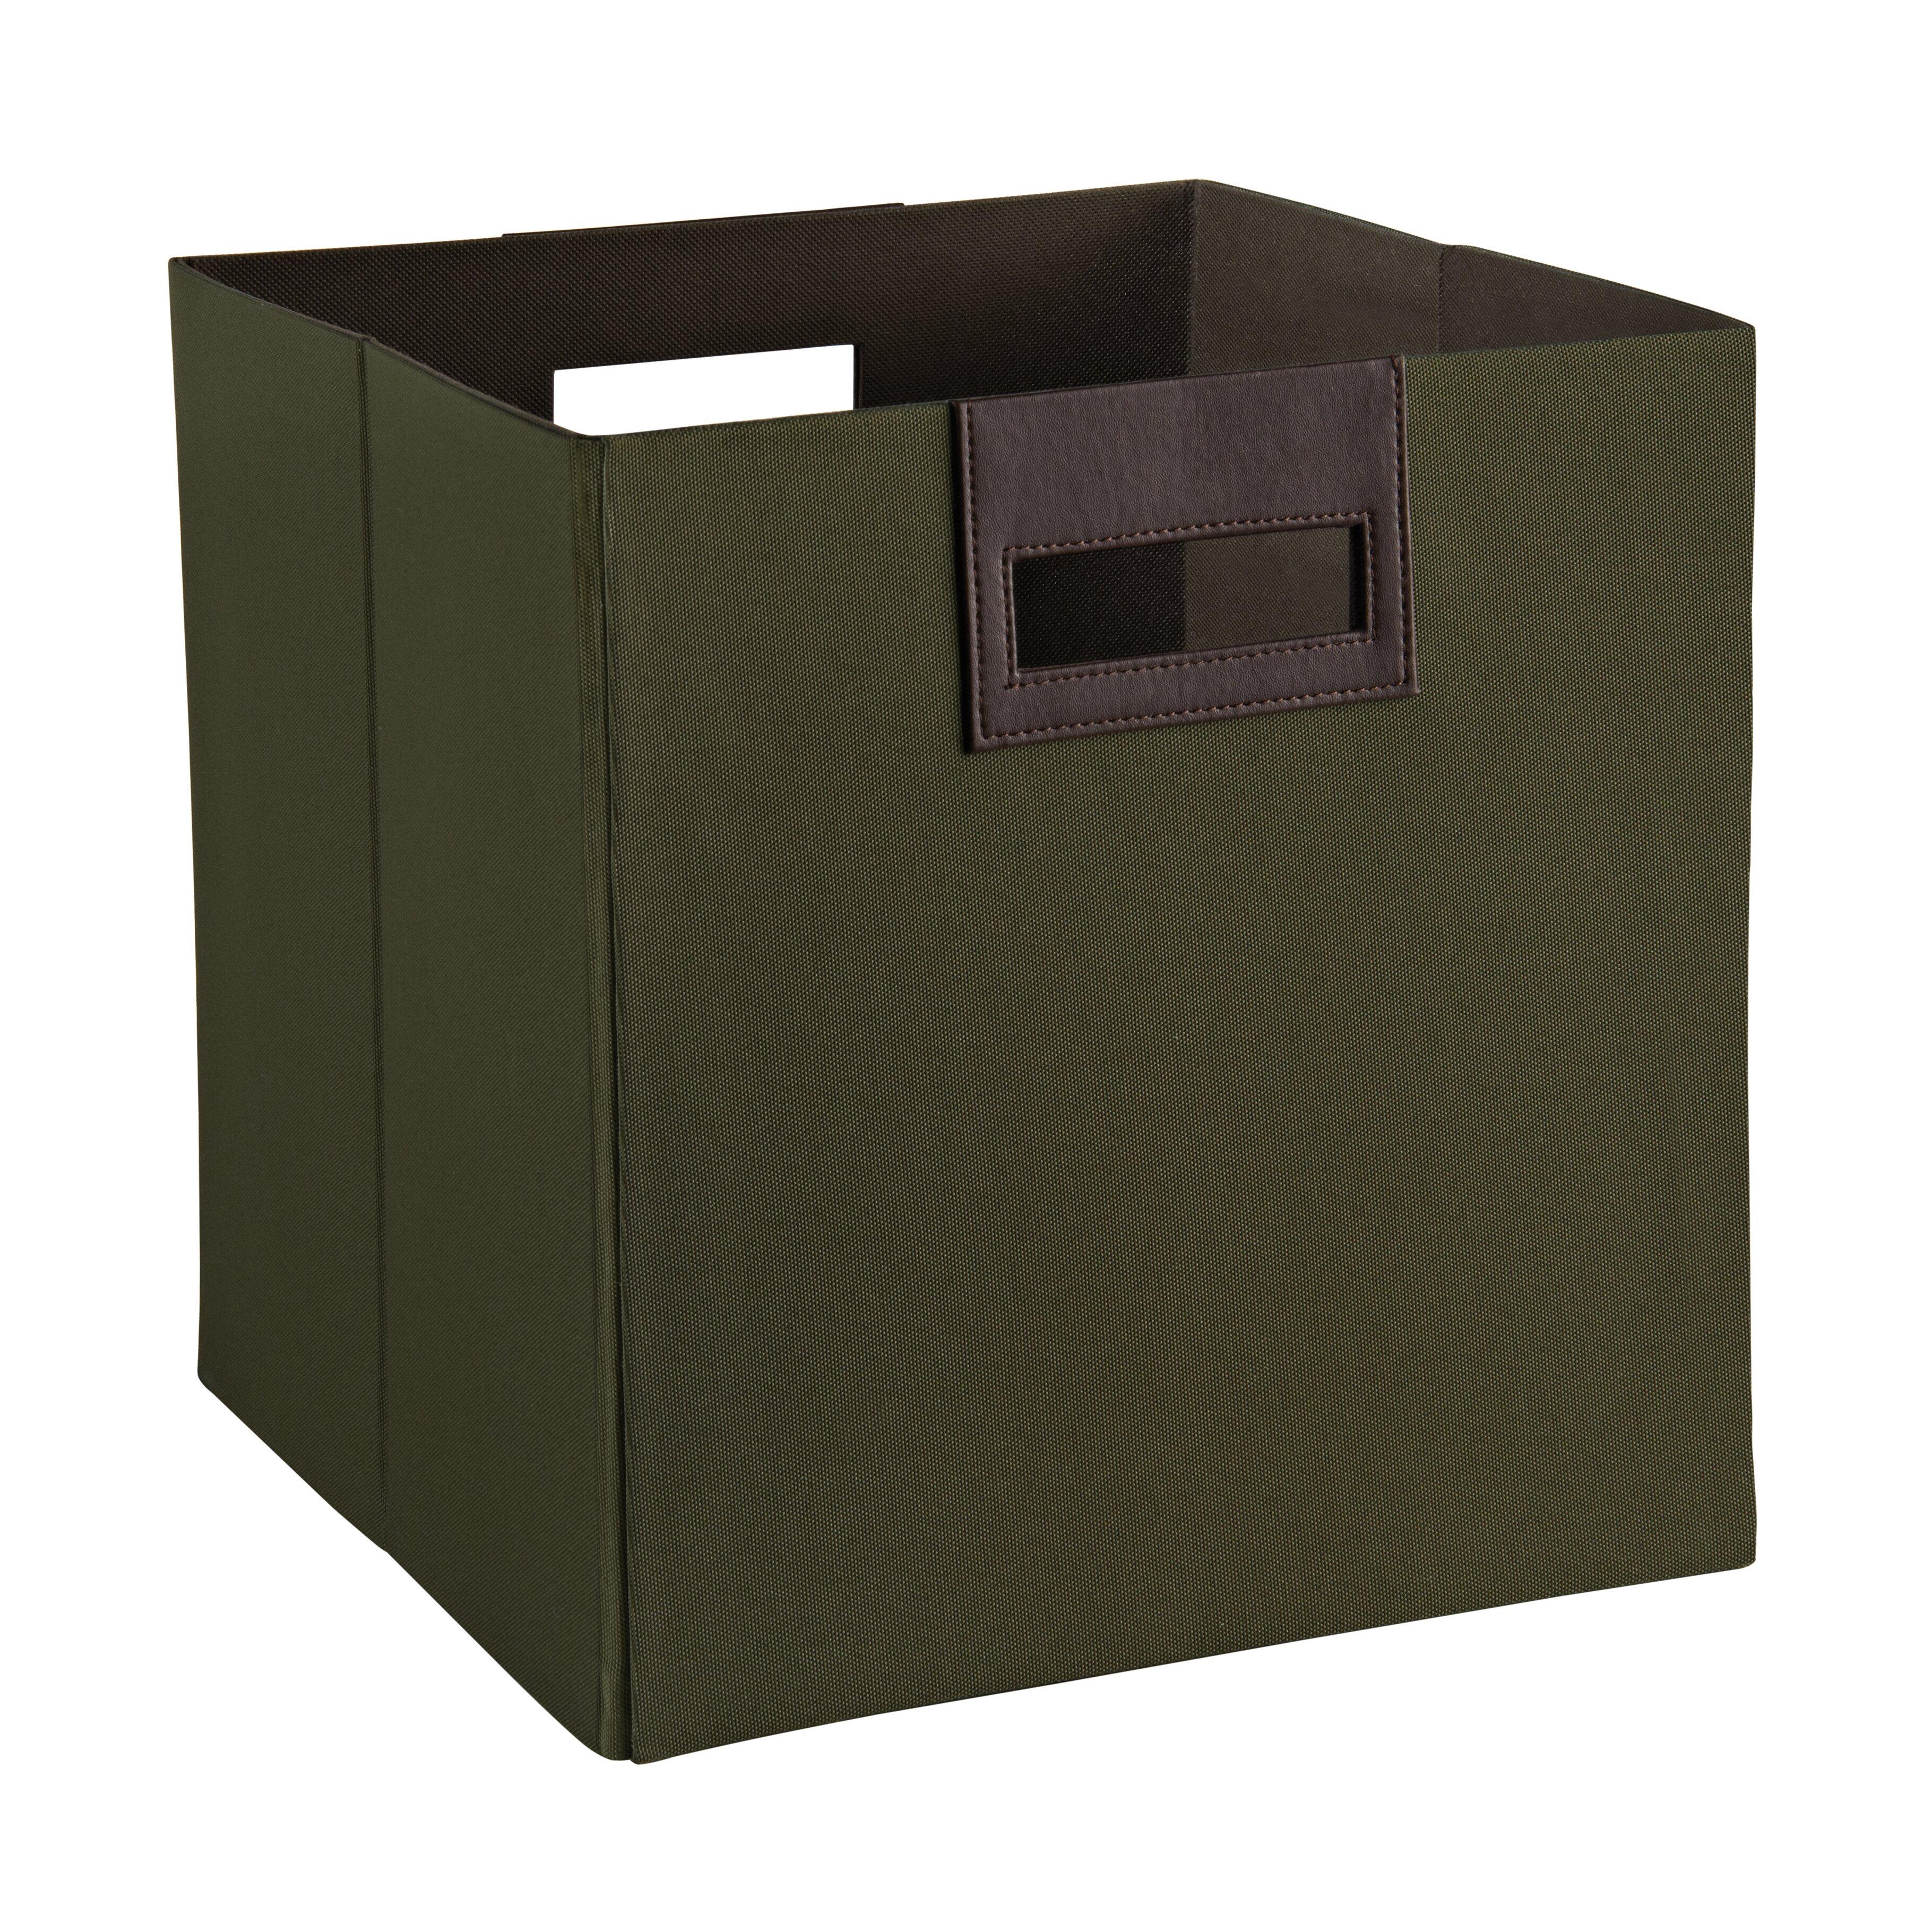 Closetmaid Decorative Storage Fabric Bin Reviews Wayfair